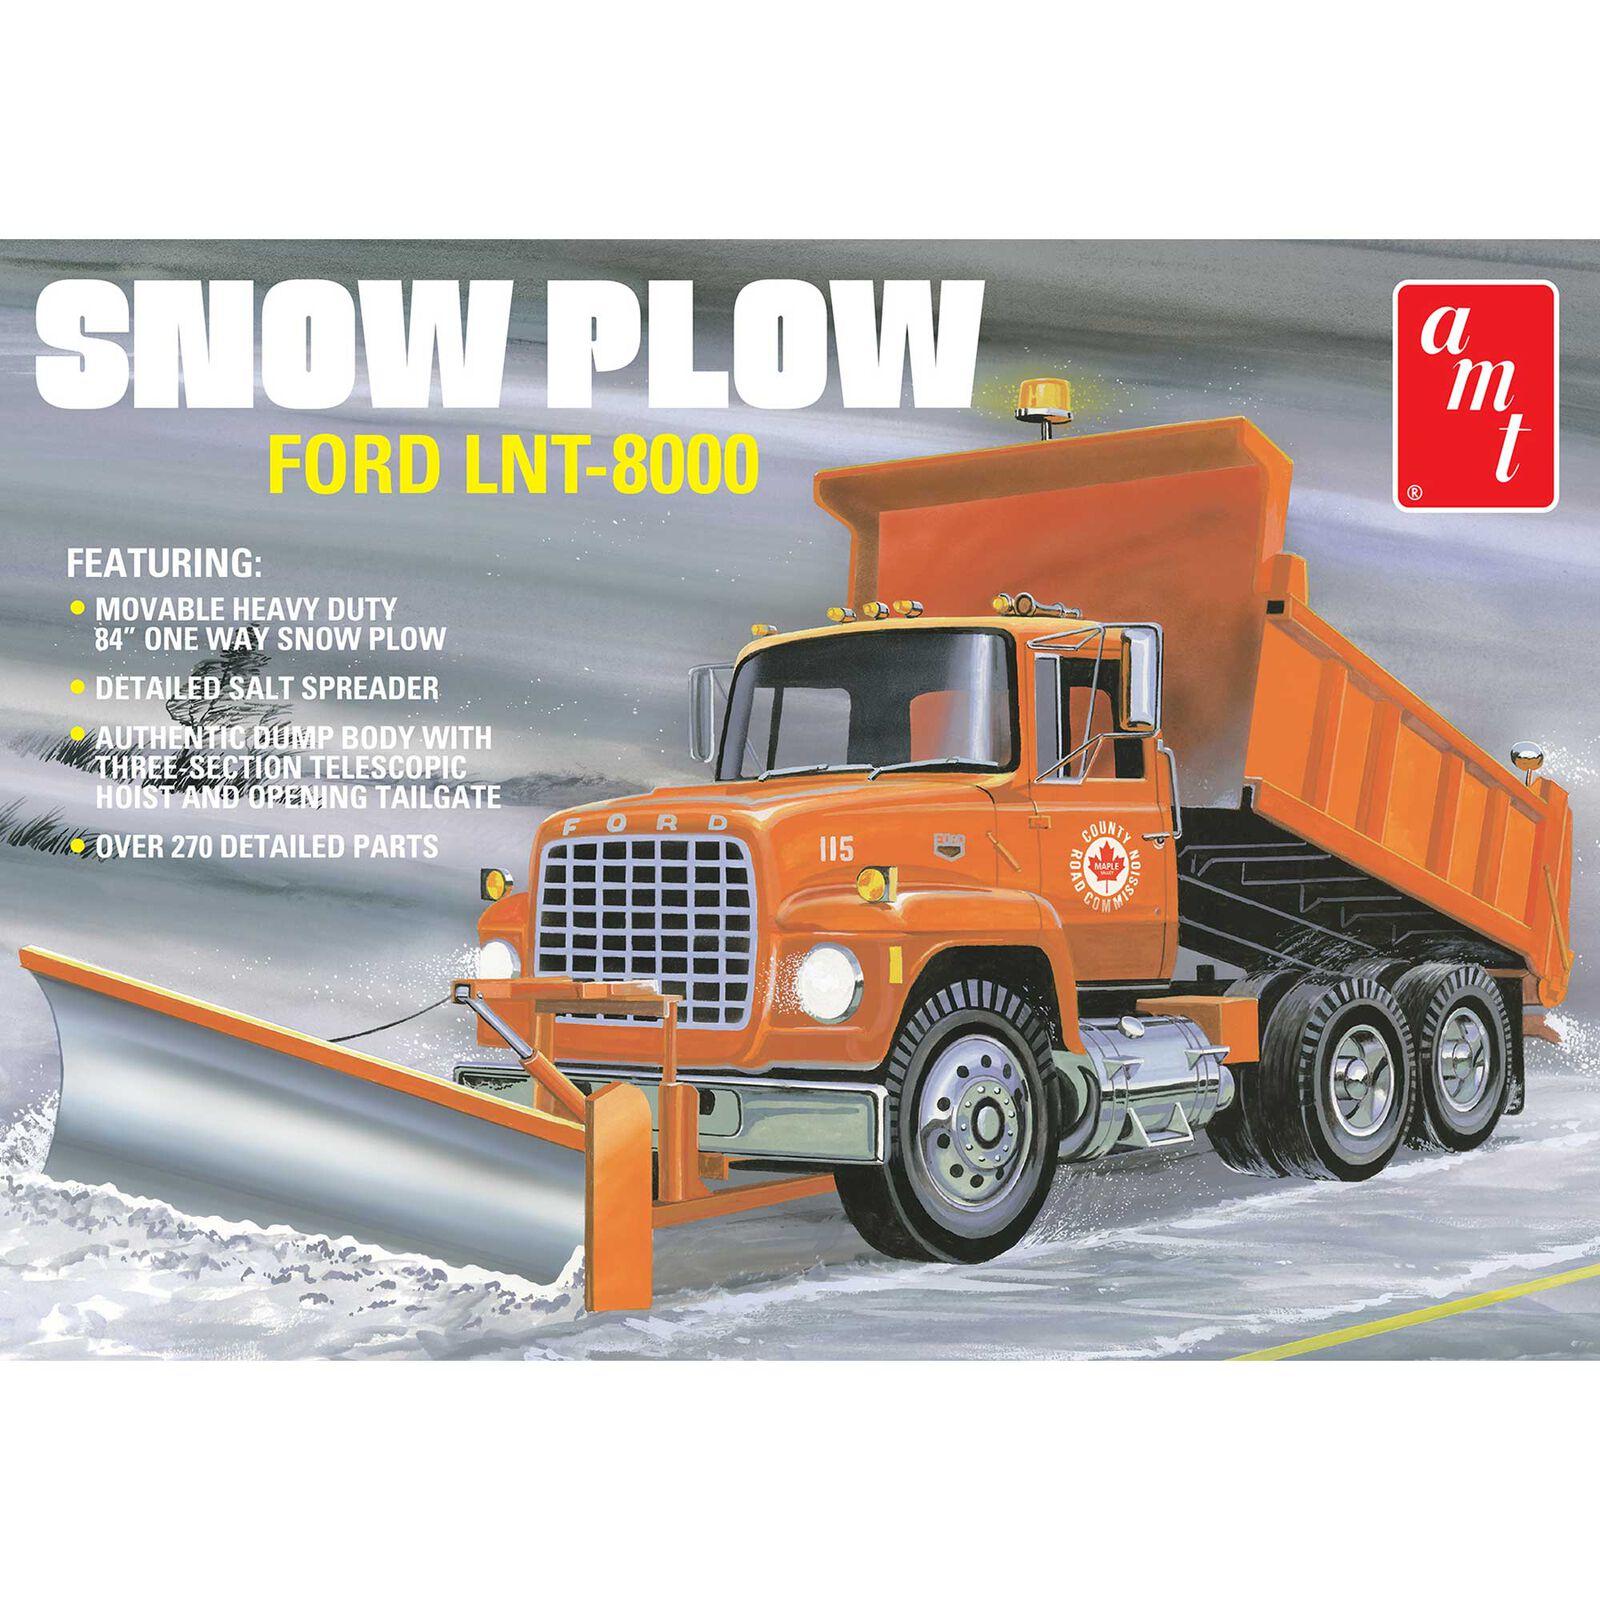 1/25 Ford LNT-8000 Snow Plow